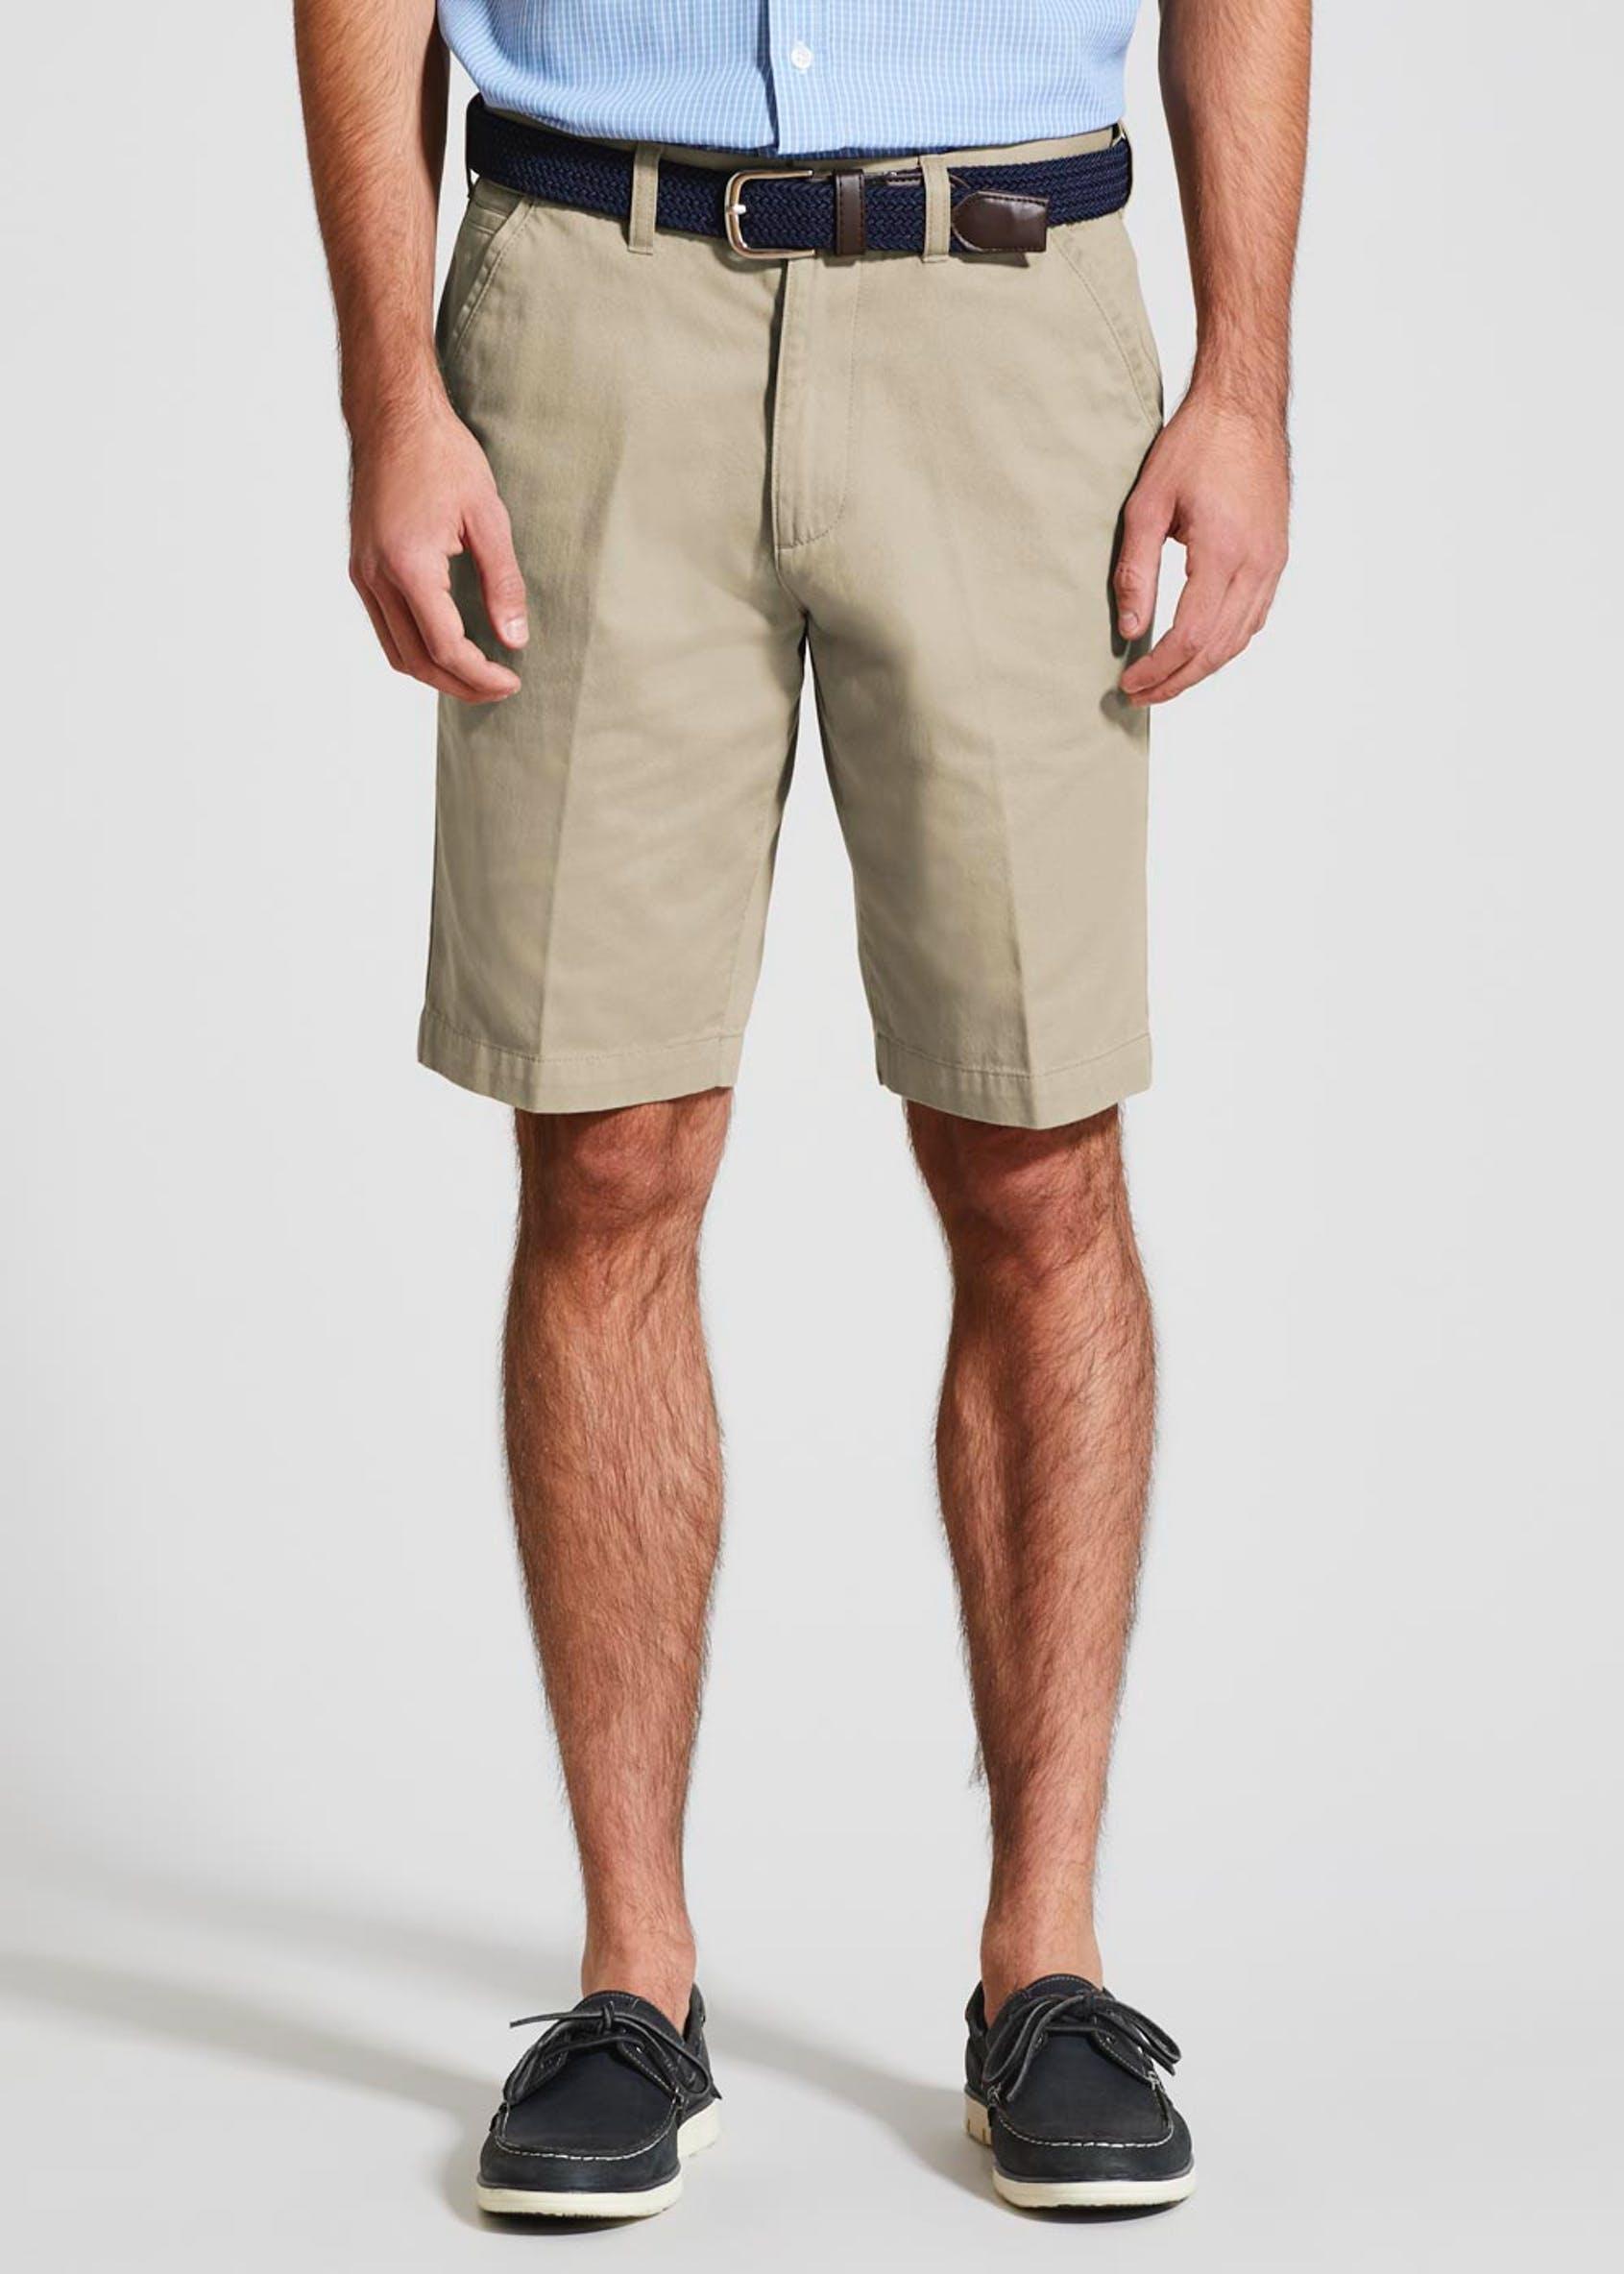 Men's Belted Chino Shorts (Free click and collect) £4 at Matalan